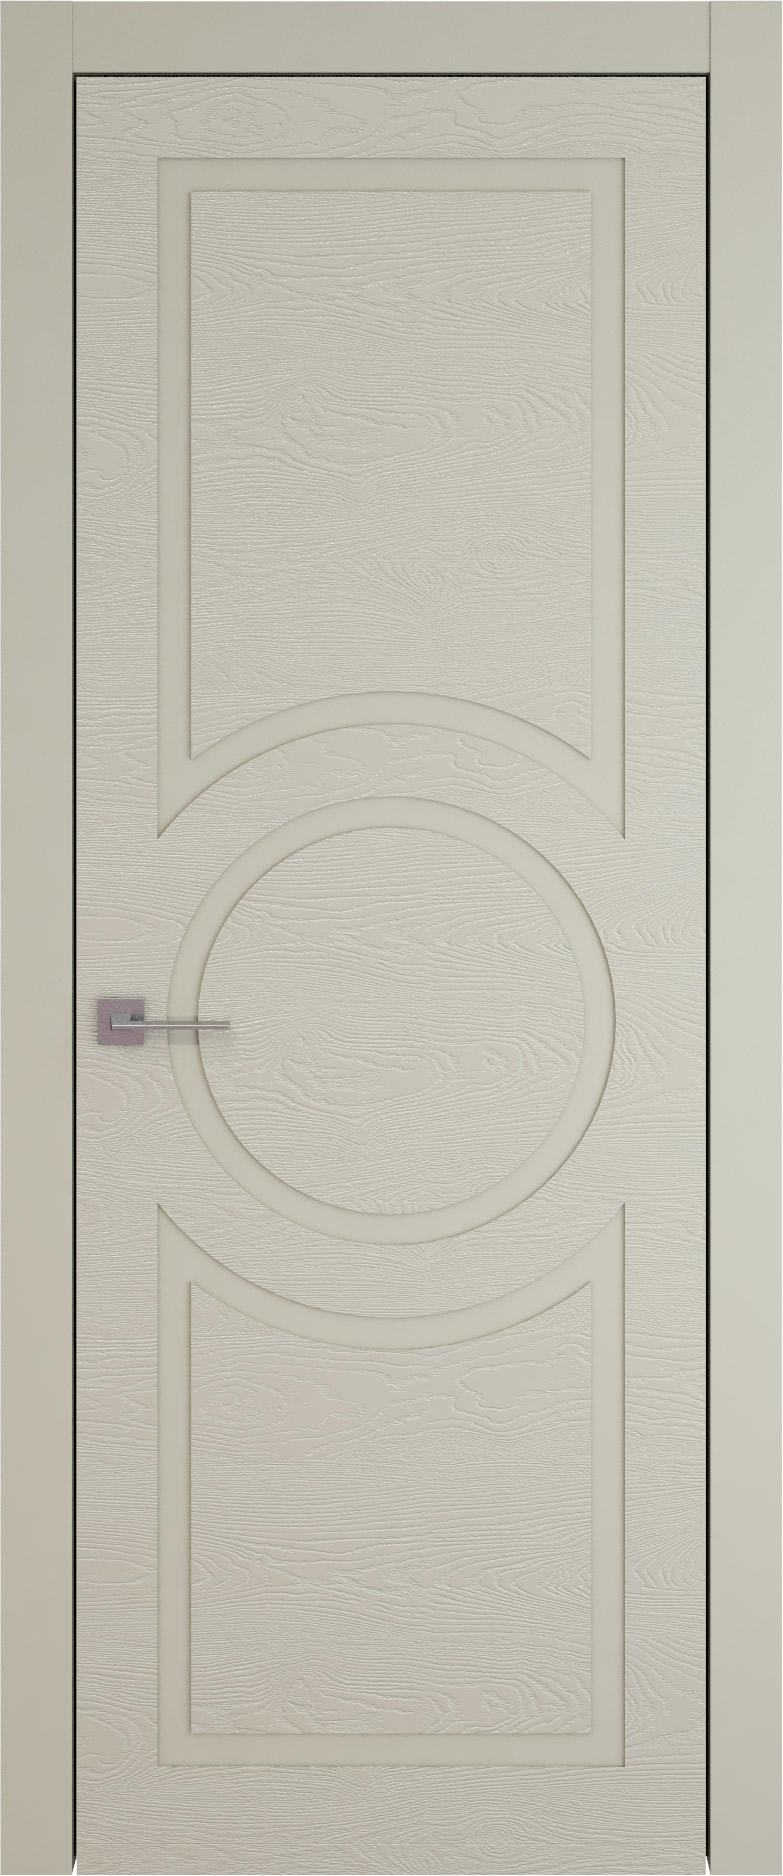 Tivoli М-5 цвет - Серо-оливковая эмаль по шпону (RAL 7032) Без стекла (ДГ)